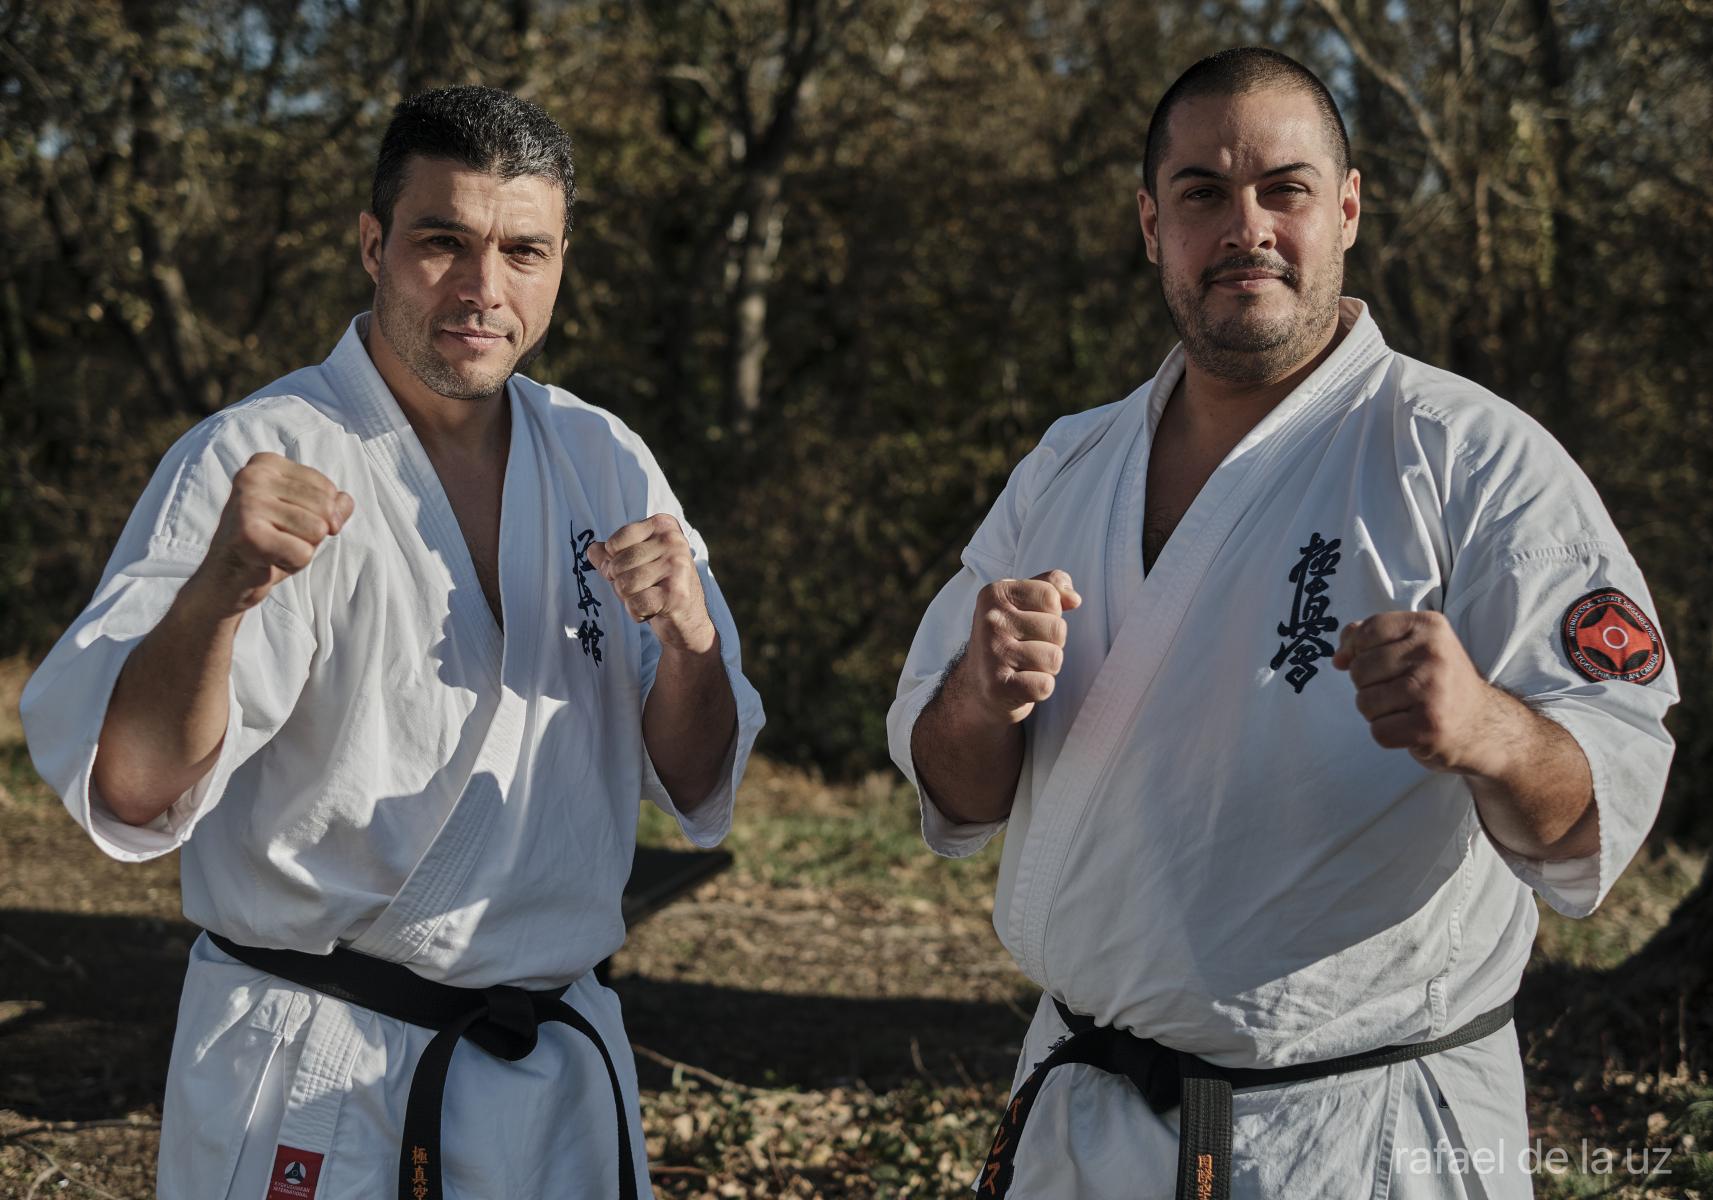 Copy-of-Karate-006